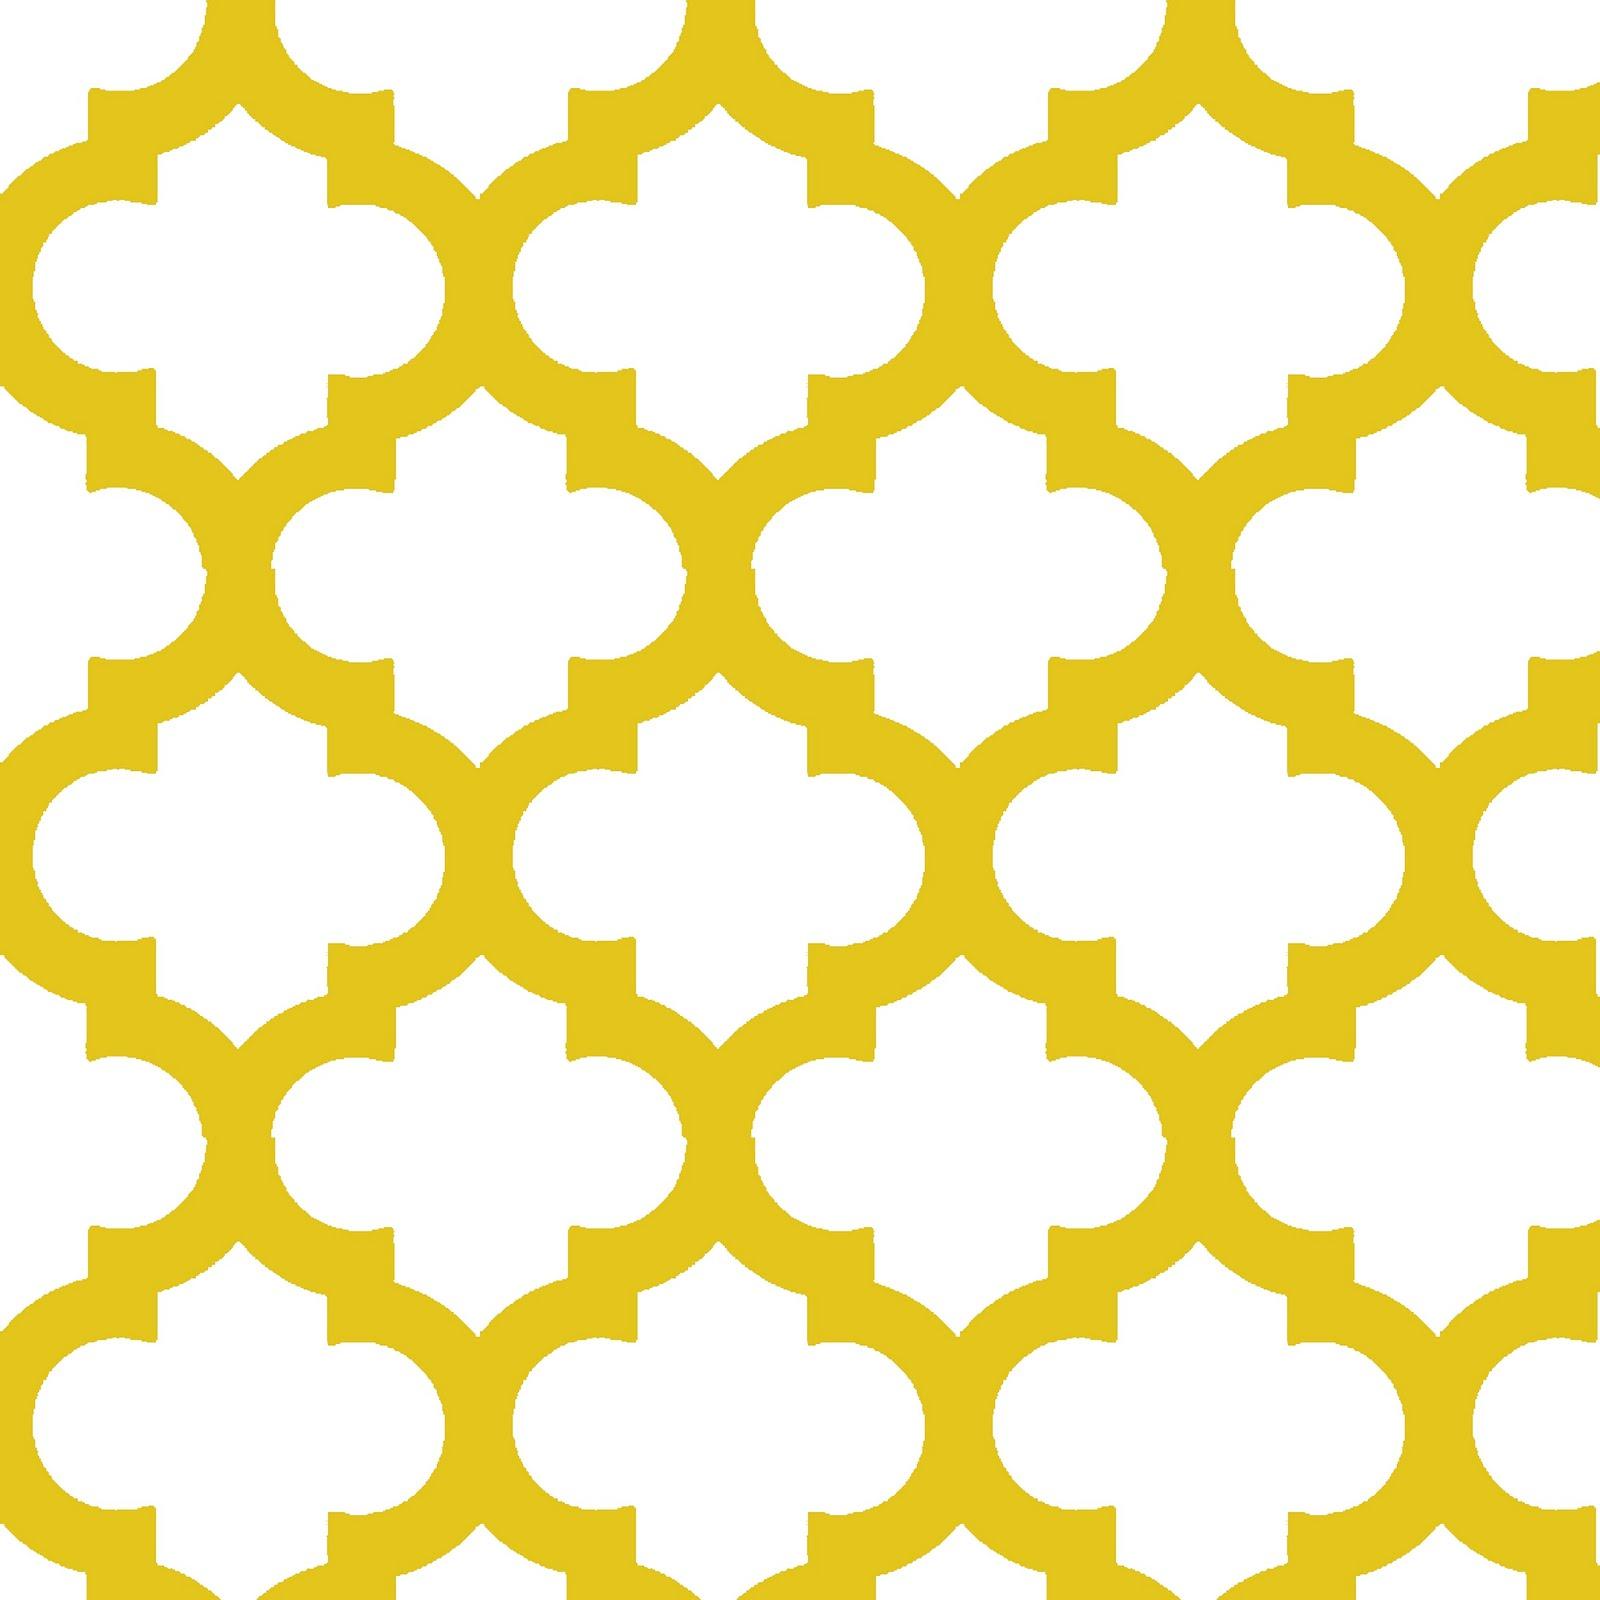 Preppy Patterns Wallpaper Backgrounds for work Pinterest 1600x1600